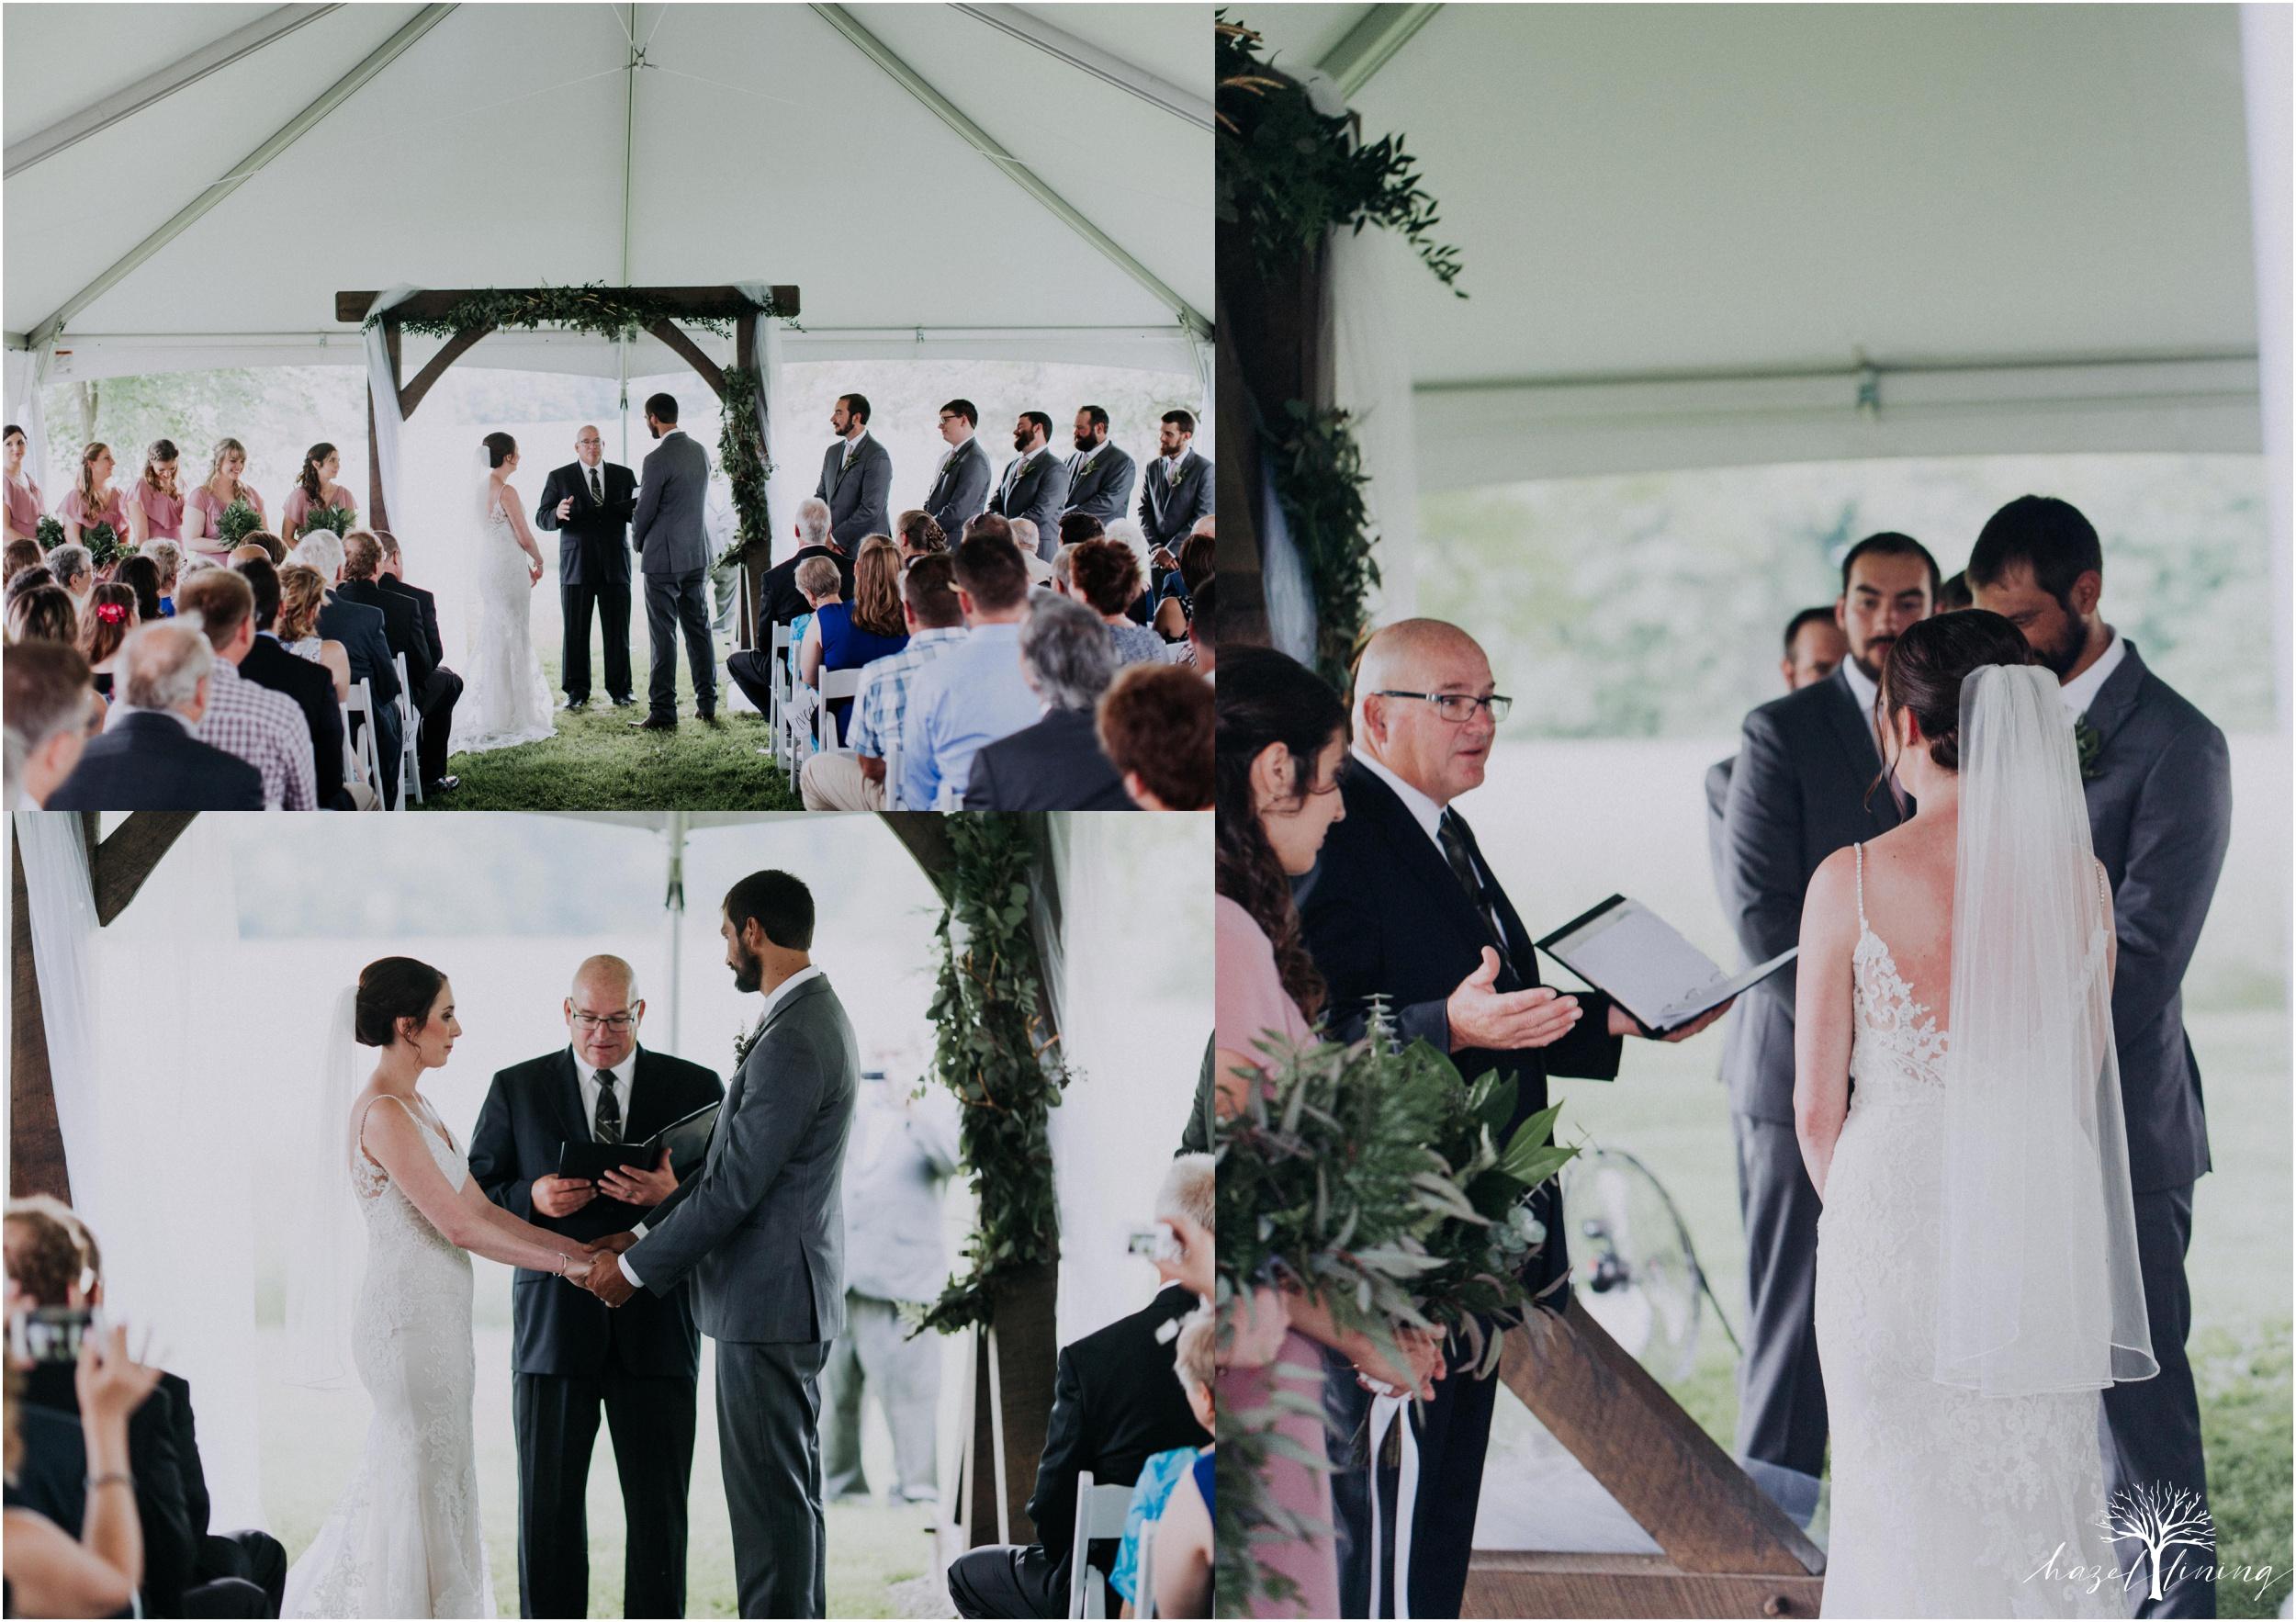 hazel-lining-travel-wedding-elopement-photography-lisa-landon-shoemaker-the-farm-bakery-and-events-bucks-county-quakertown-pennsylvania-summer-country-outdoor-farm-wedding_0057.jpg